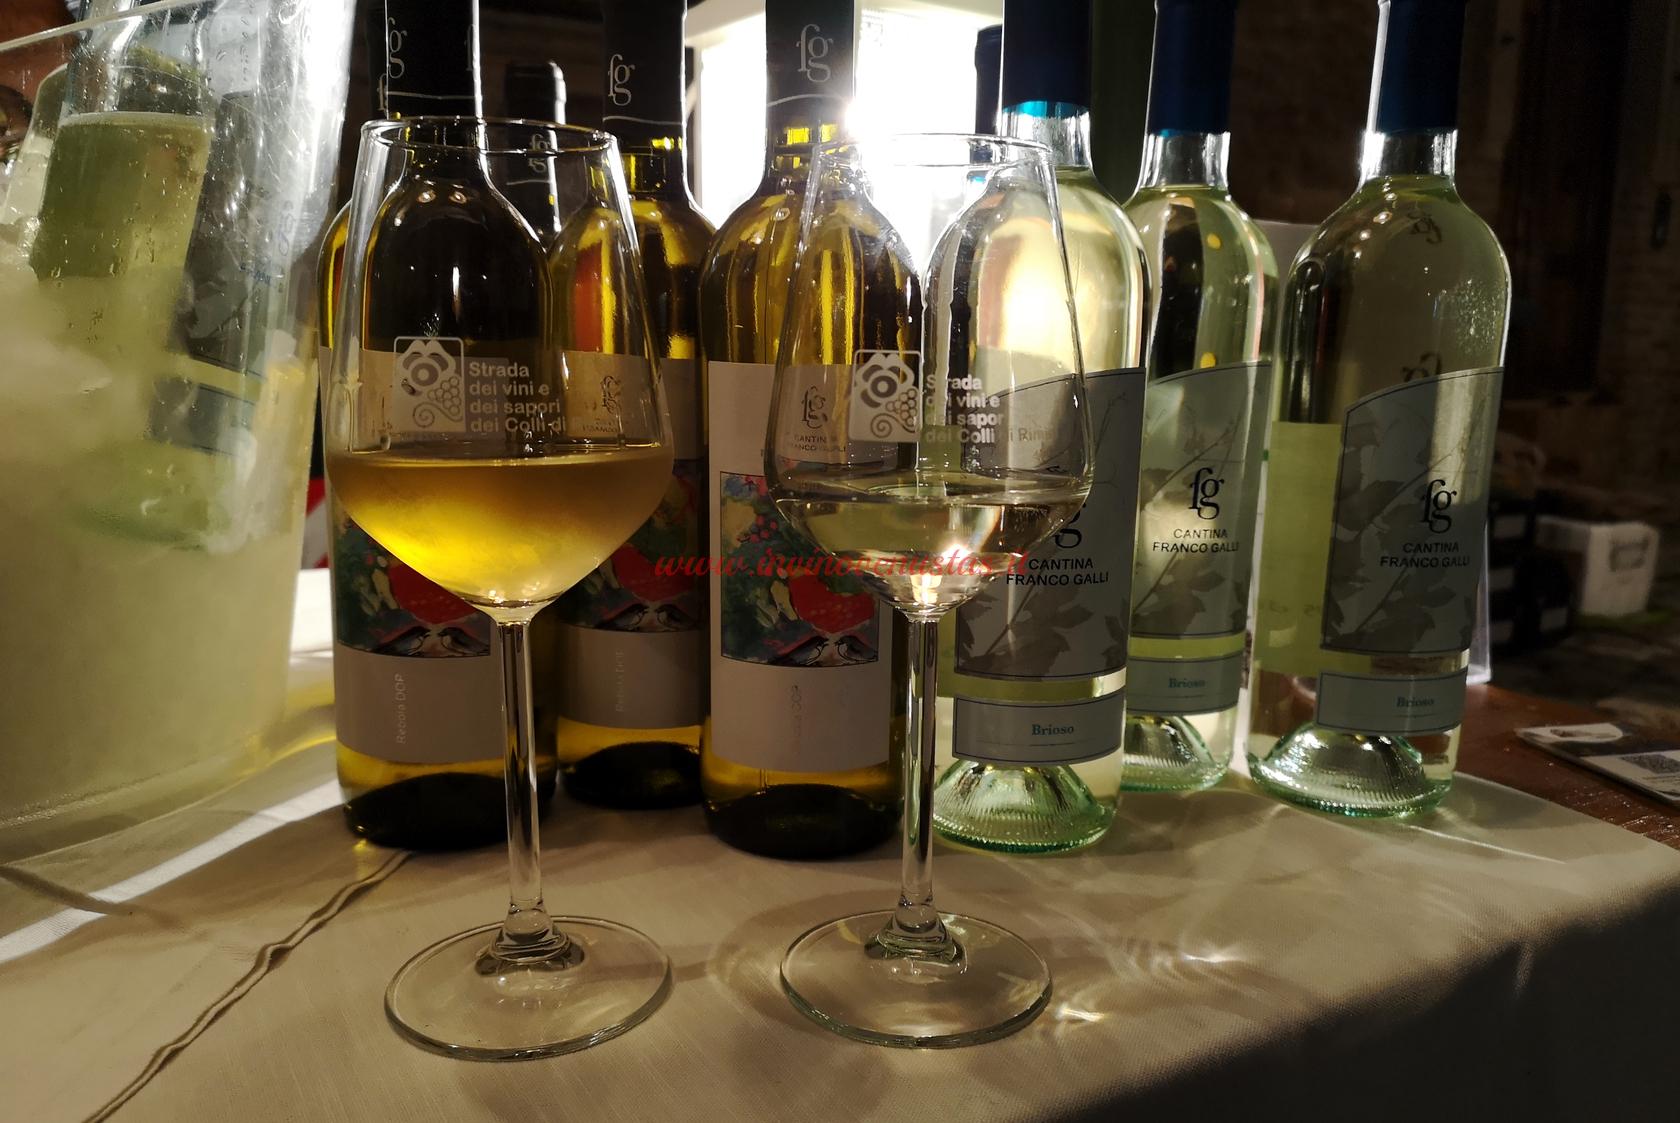 Vini bianchi Franco Galli p.assaggi di vino 2020